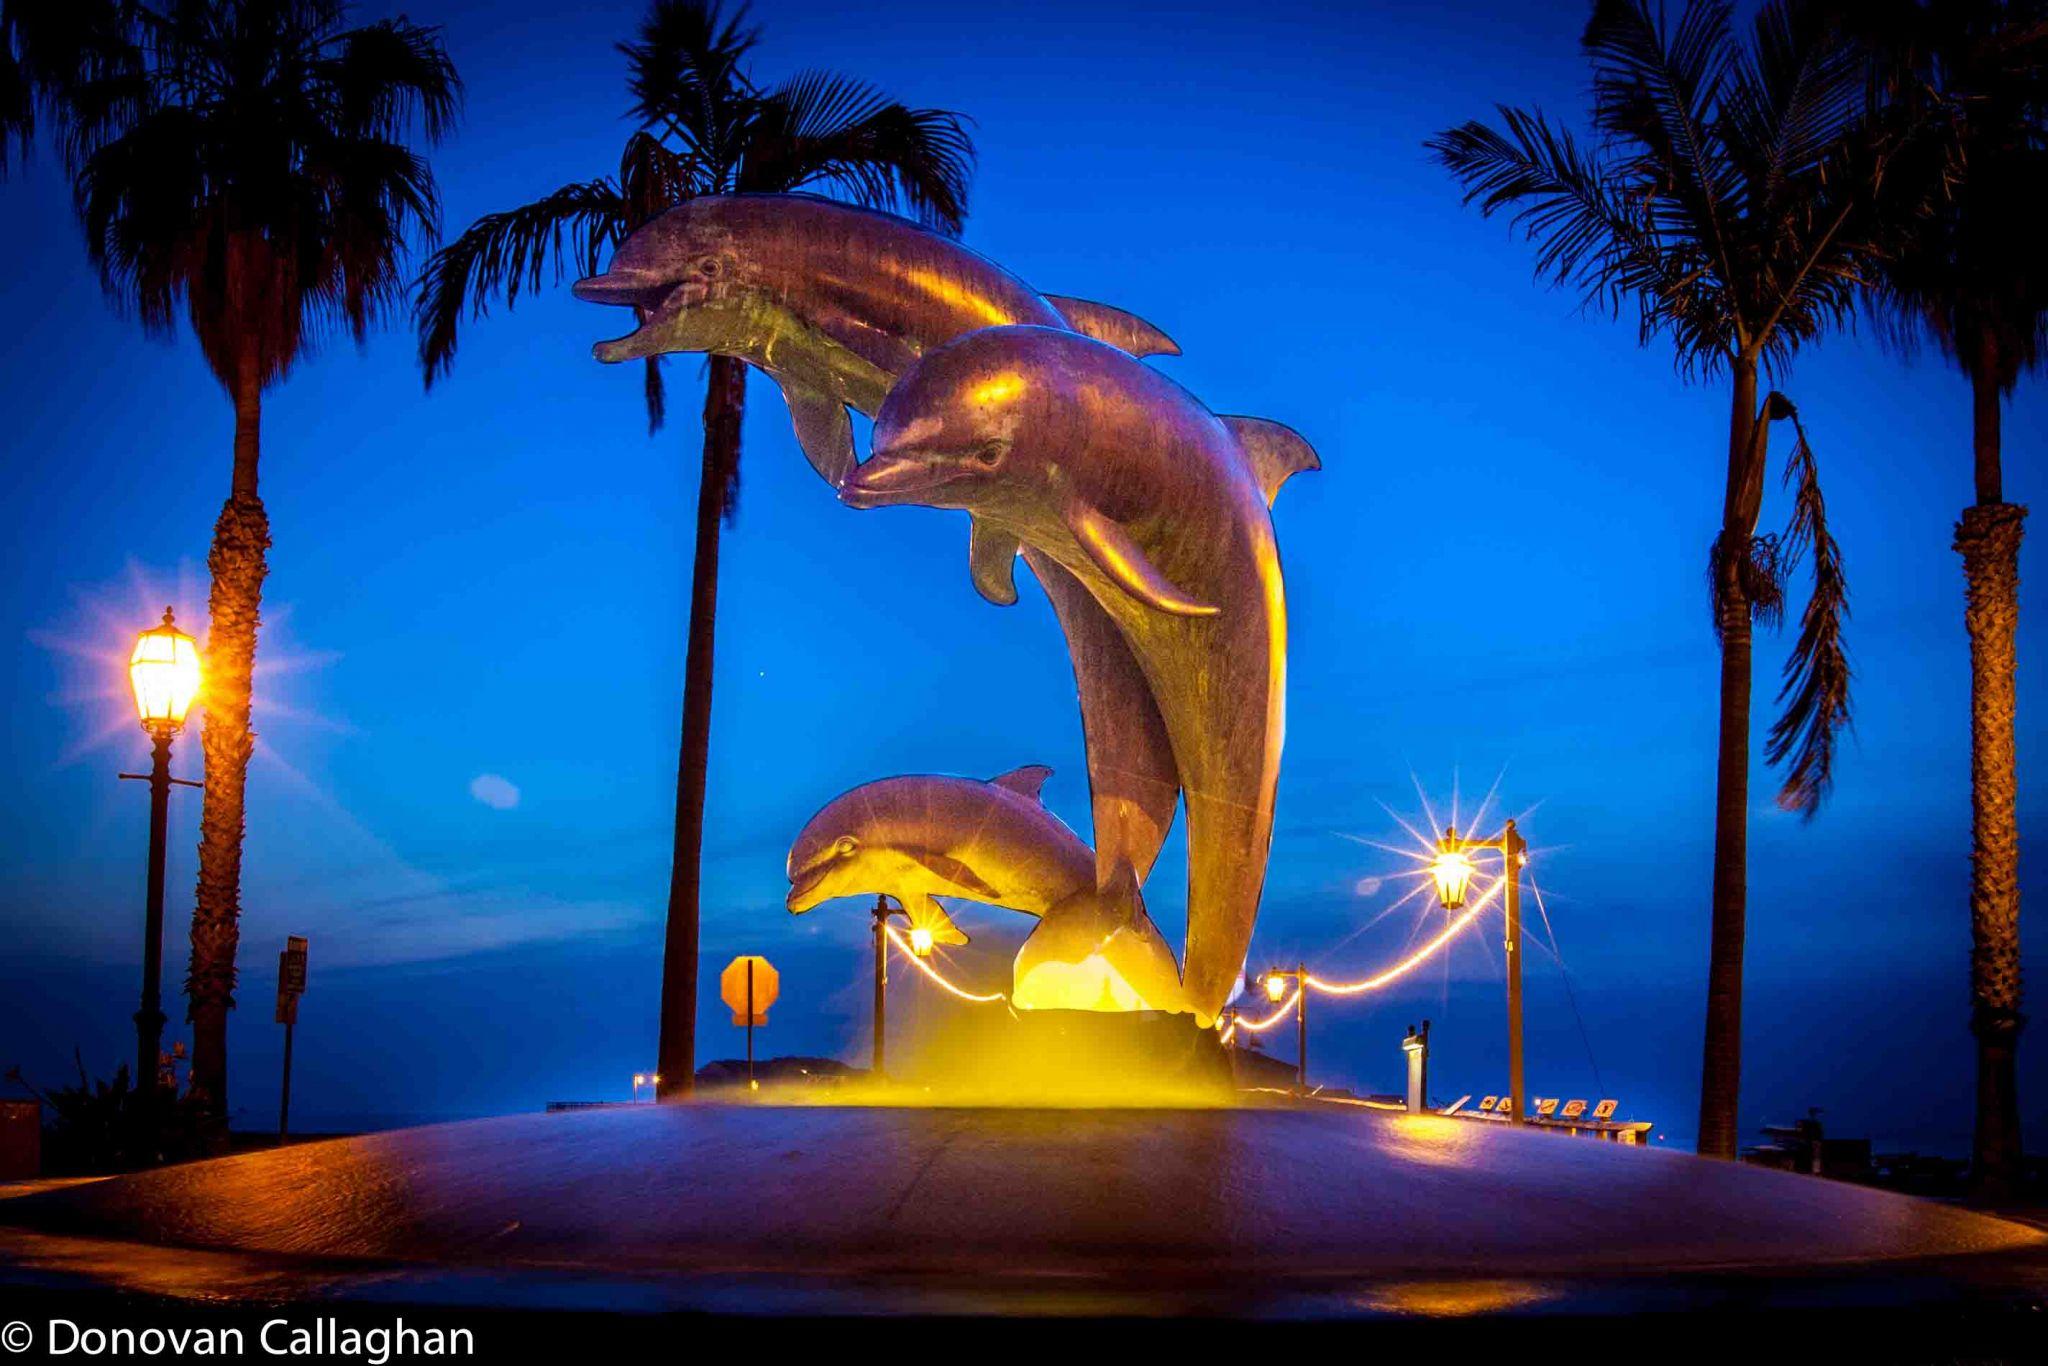 Dolphin Fountain at night Santa Barbara, USA